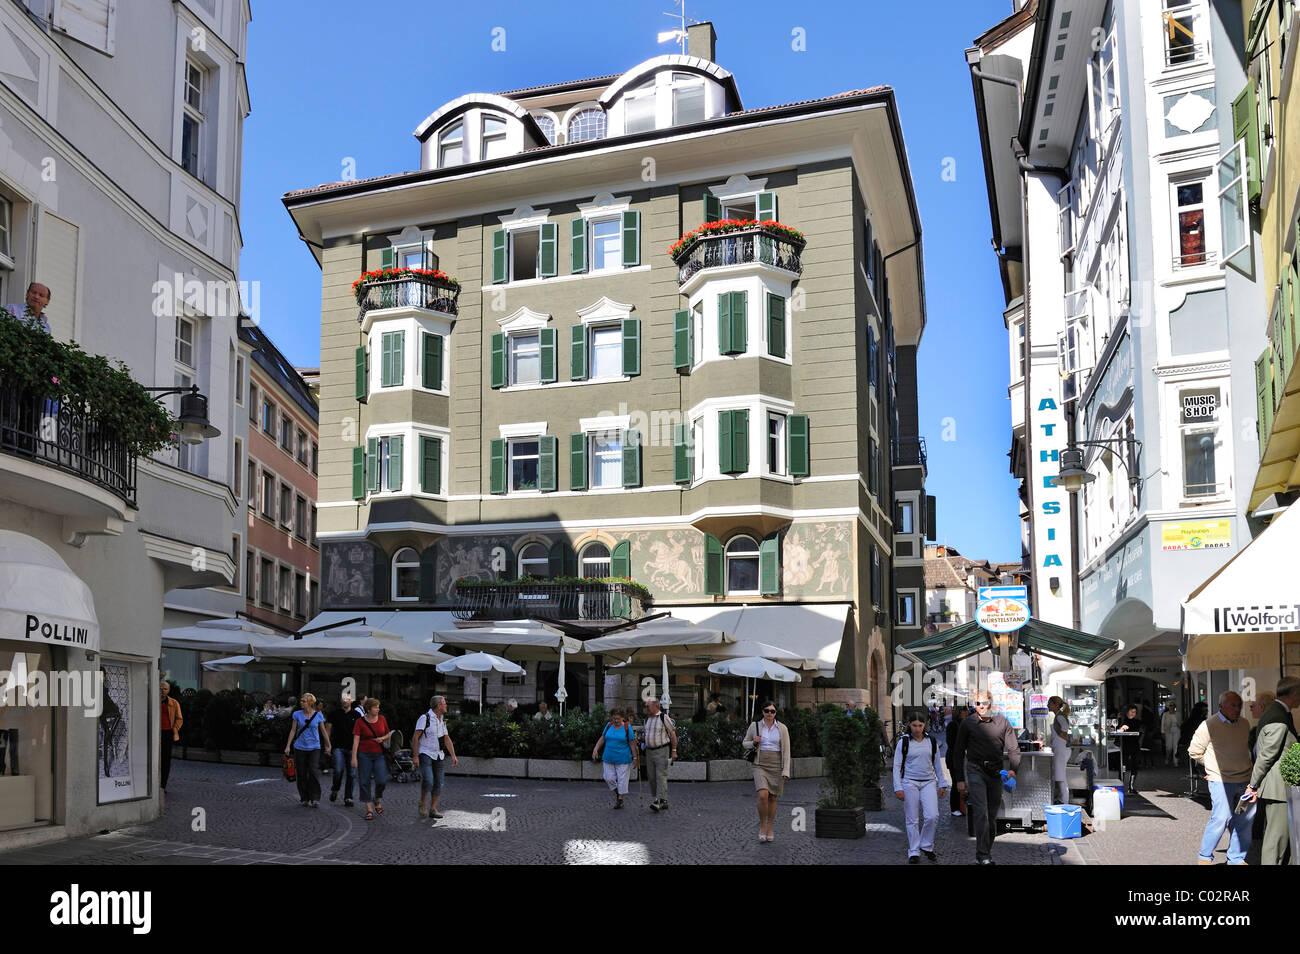 Dominican square Bolzano, South Tyrol, Tyrol, Italy, Europe - Stock Image